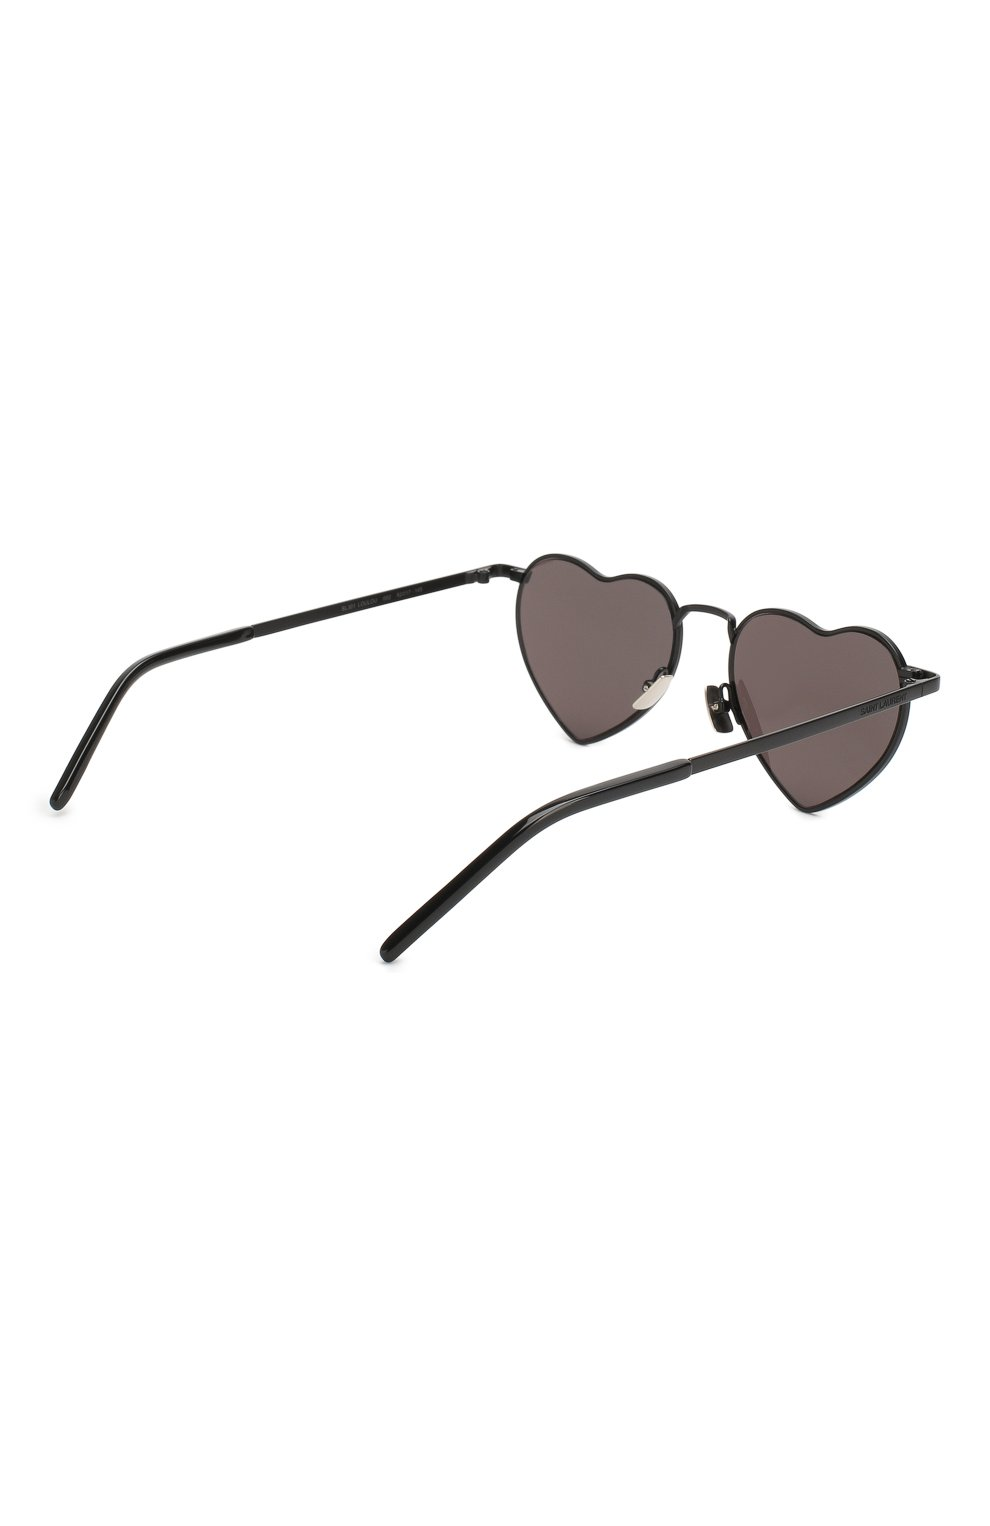 Женские солнцезащитные очки SAINT LAURENT черного цвета, арт. SL 301 L0UL0U 002 | Фото 4